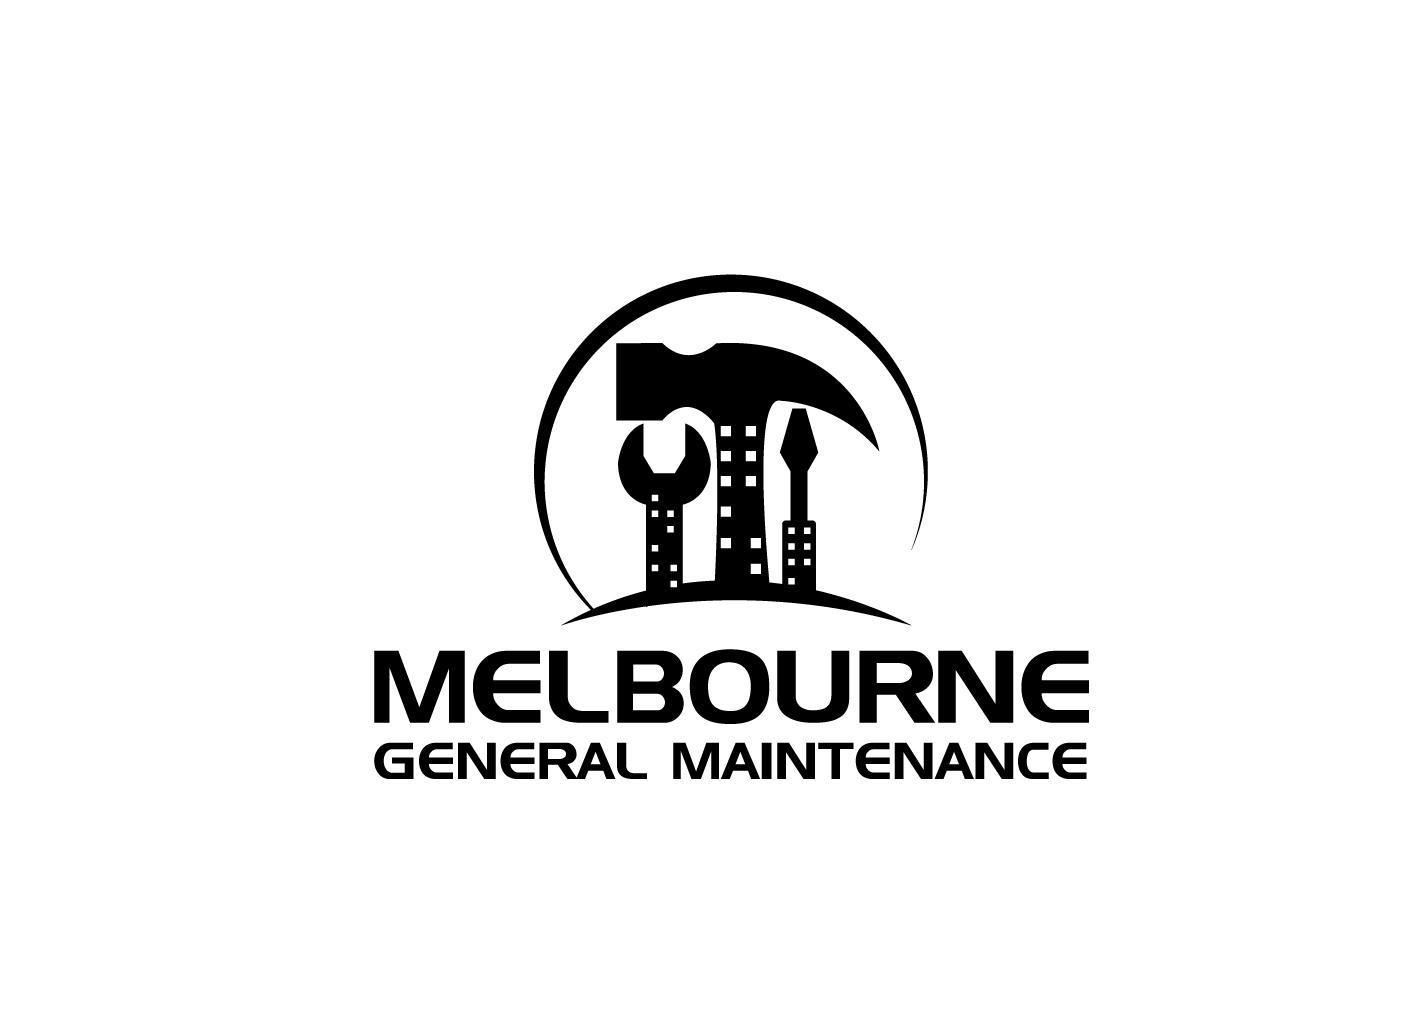 Modern, Professional, Property Maintenance Logo Design for